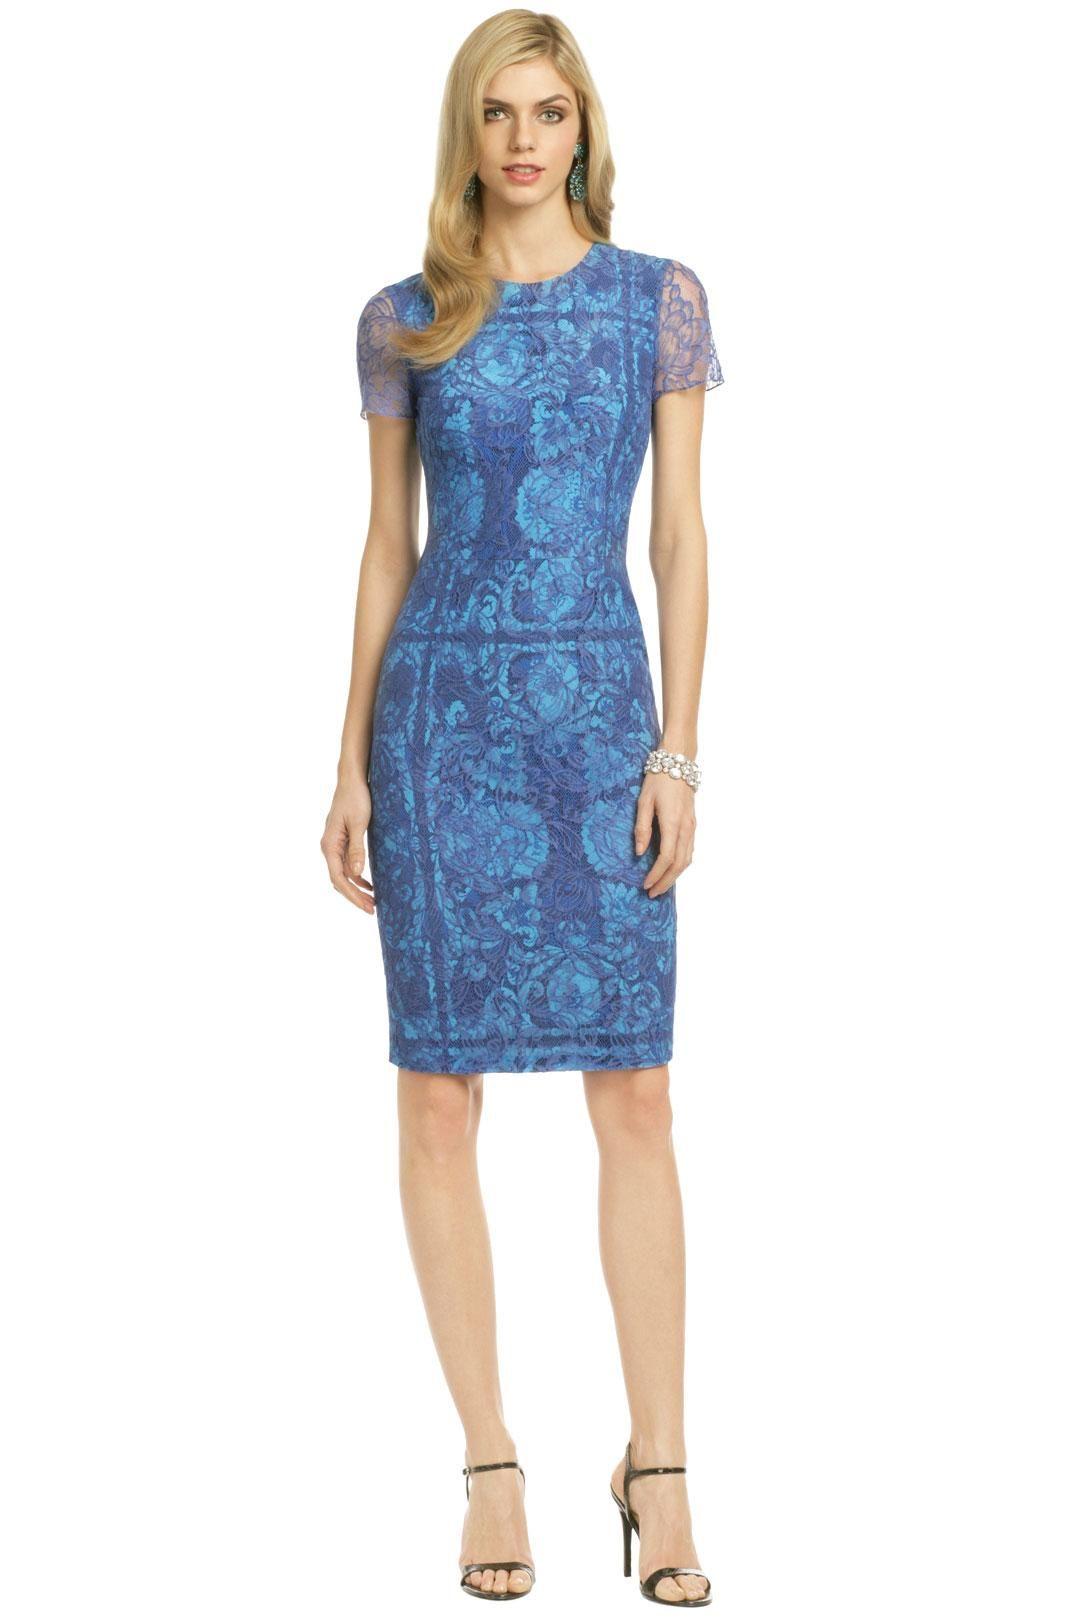 Vera Wang Tulum Waters Sheath Plus size vintage dresses